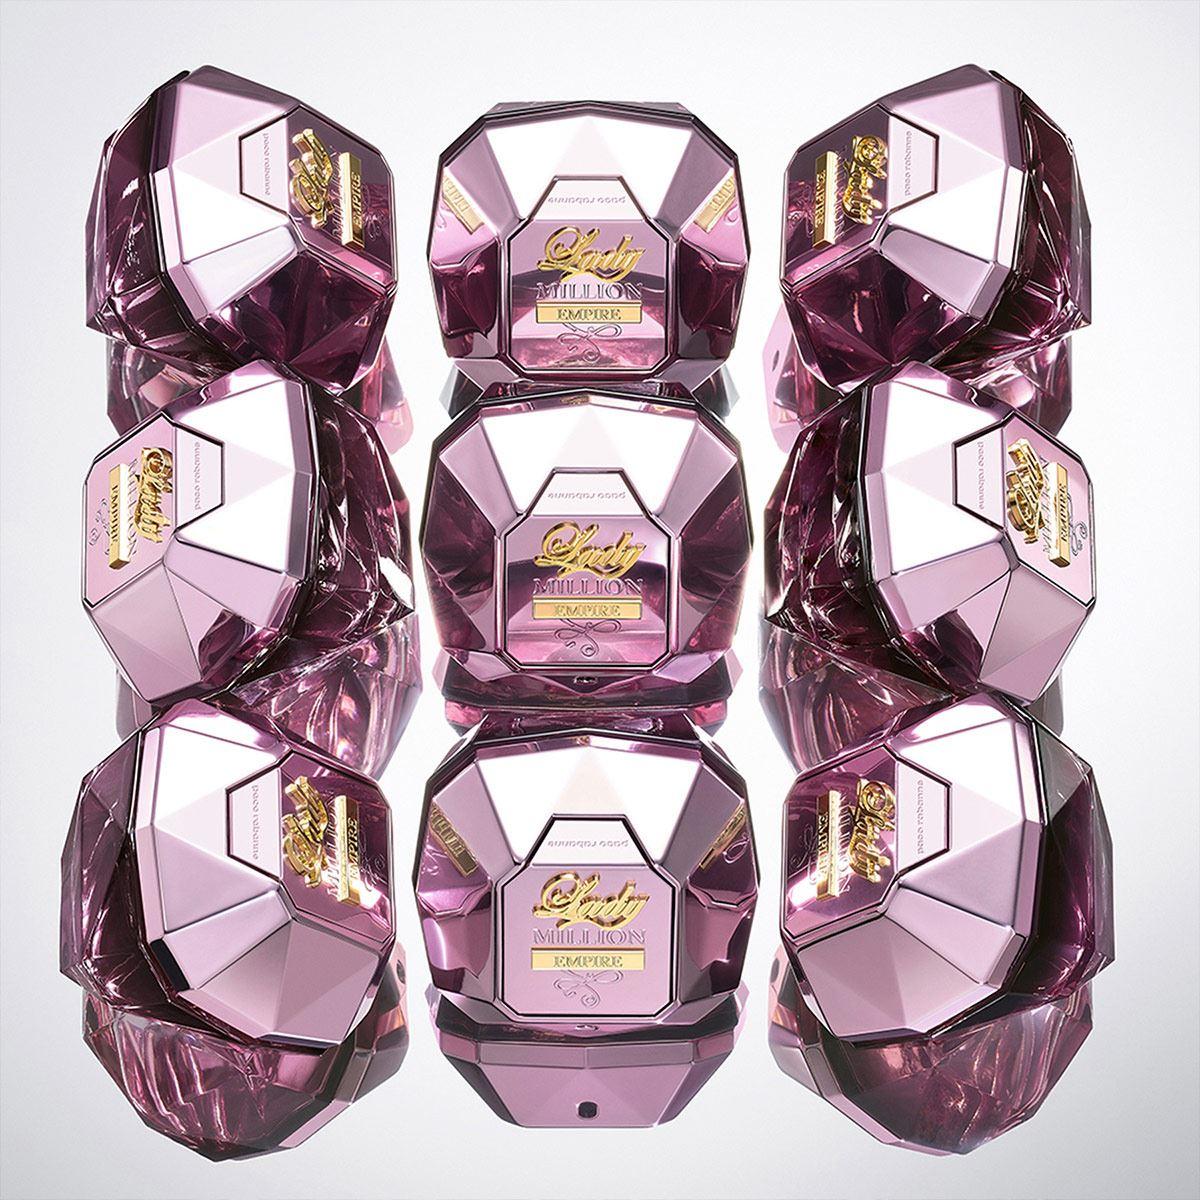 Set para dama, Paco Rabanne, Lady Million Empire, EDP 80 ML + body lotion 100 ML + travel spray 10 ML